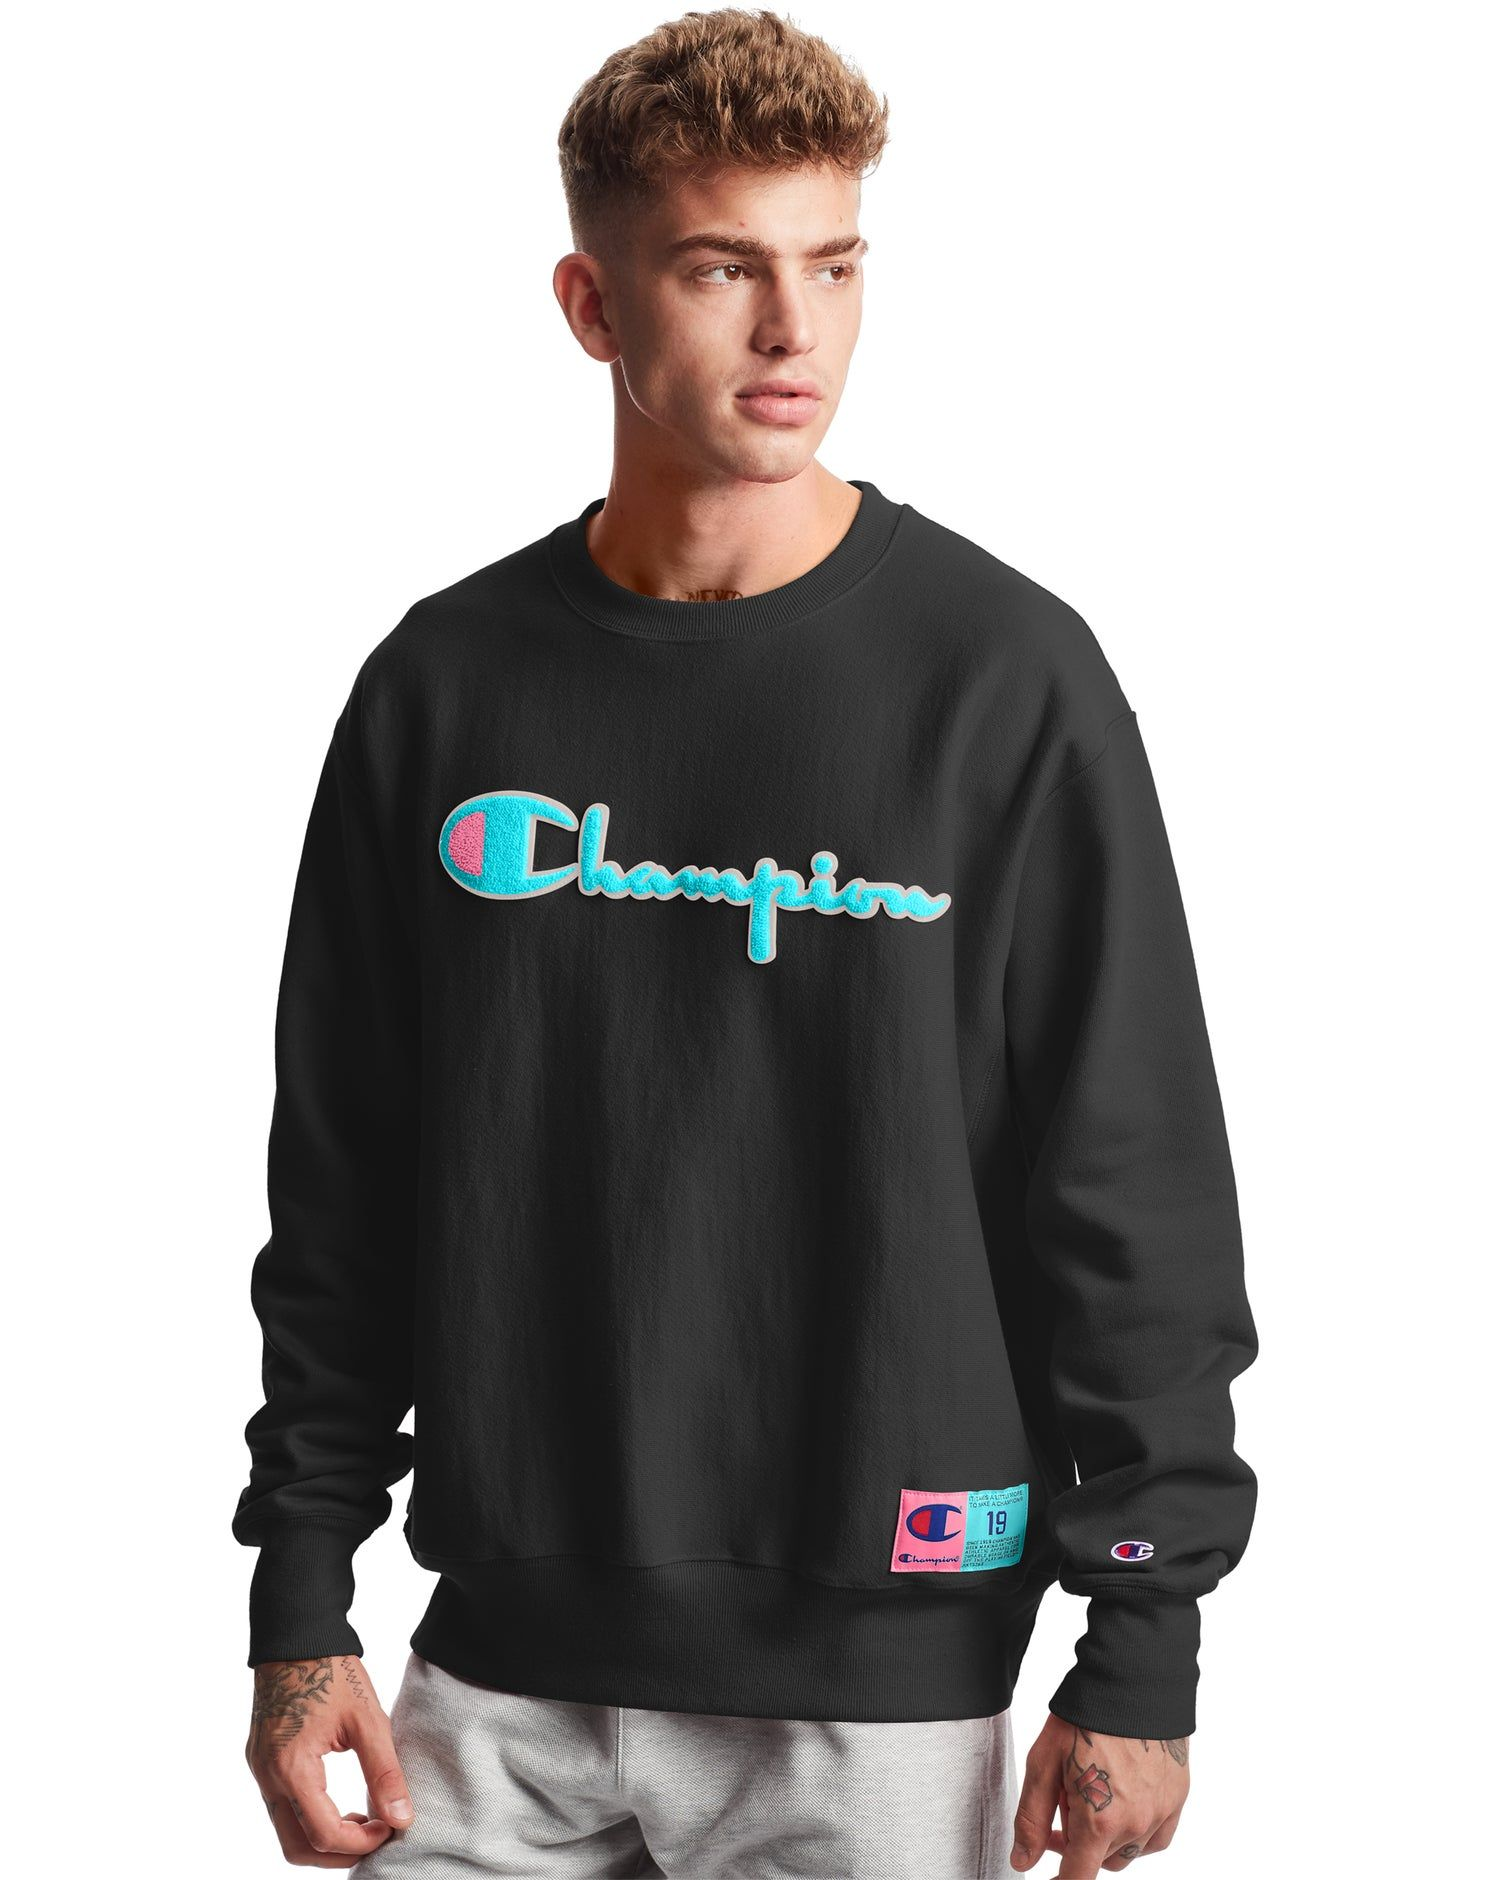 Men S Athletic Hoodies Sweatshirts Champion Sweatshirts Sweatshirts Hoodie Champion Clothing [ 1880 x 1500 Pixel ]